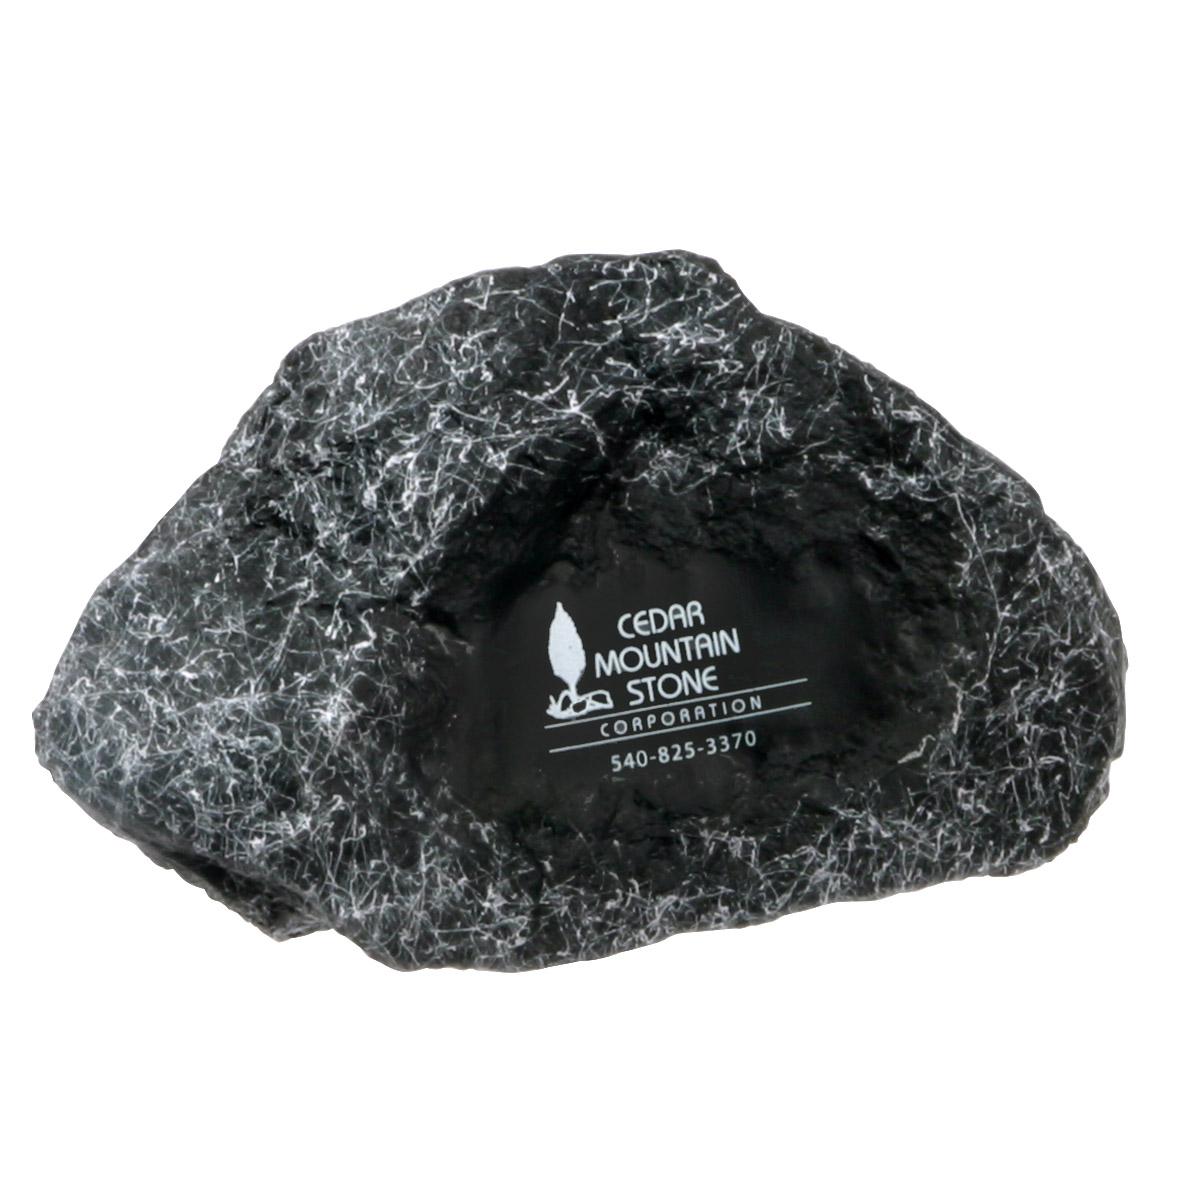 Marbled Rock Stress Reliever, LNA-MR16 - 1 Colour Imprint